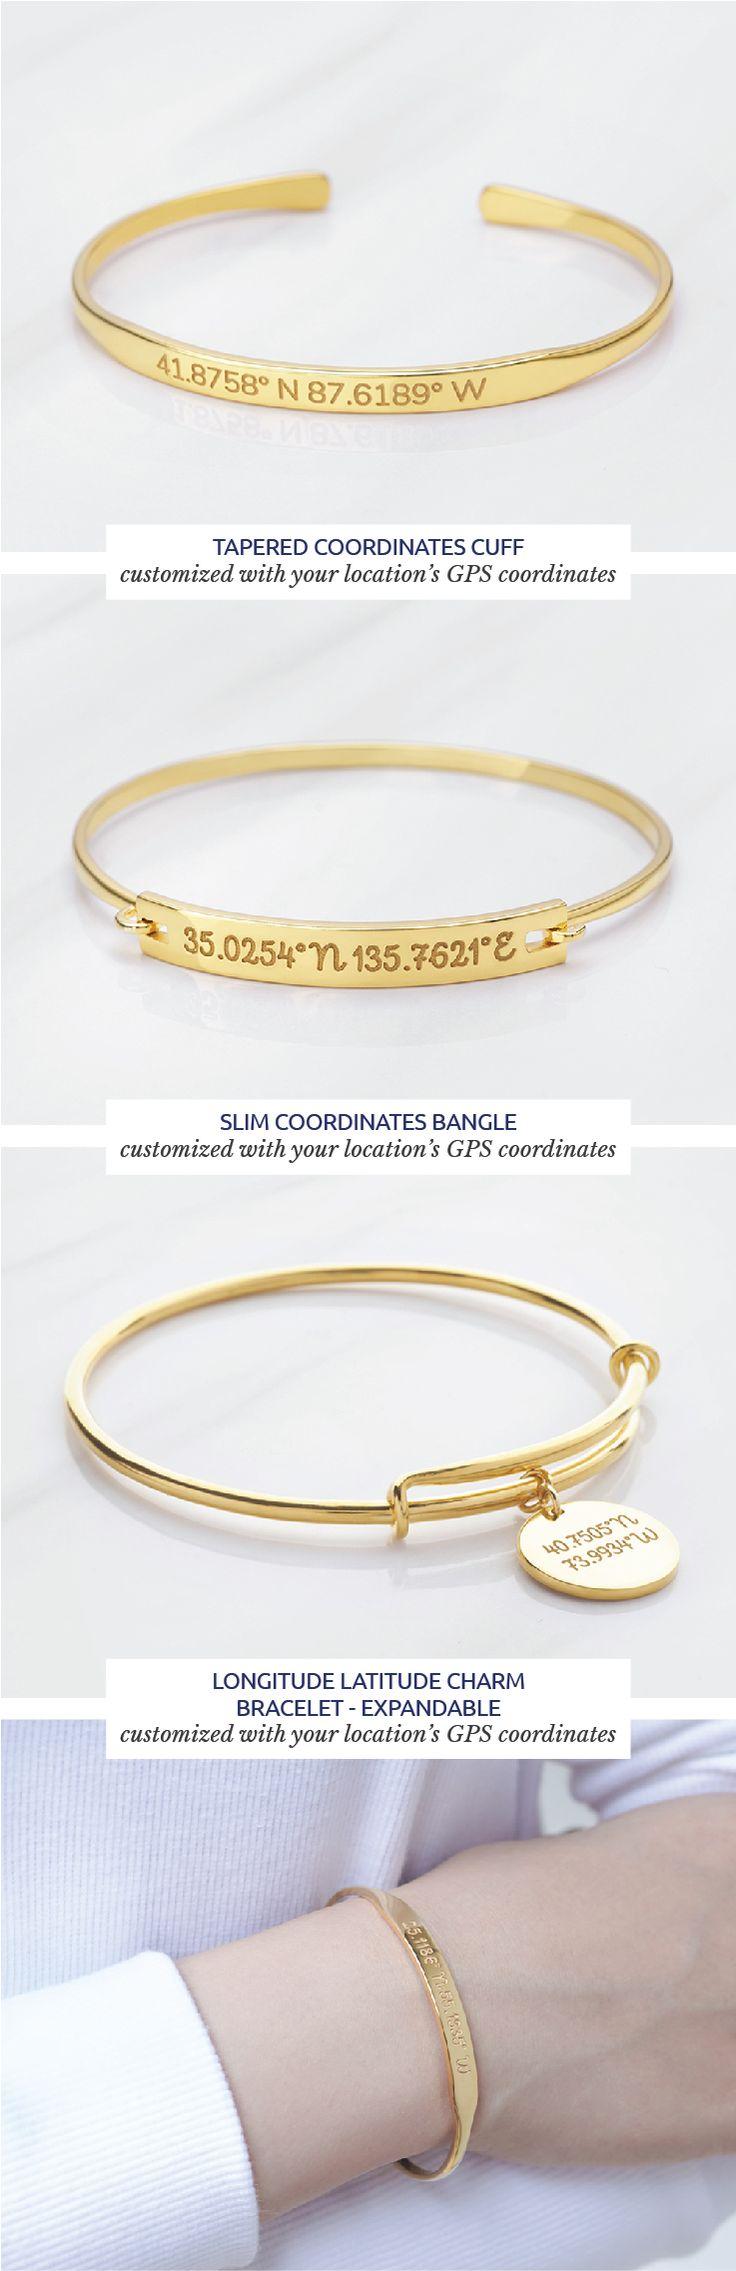 Coordinates bracelets - Gold GPS Coordinates Bracelet - Personalized Latitude Longitude Bracelet - Silver Coordinates Jewelry - Graduation Gift - Lat lo bracelet - Anniversary gifts